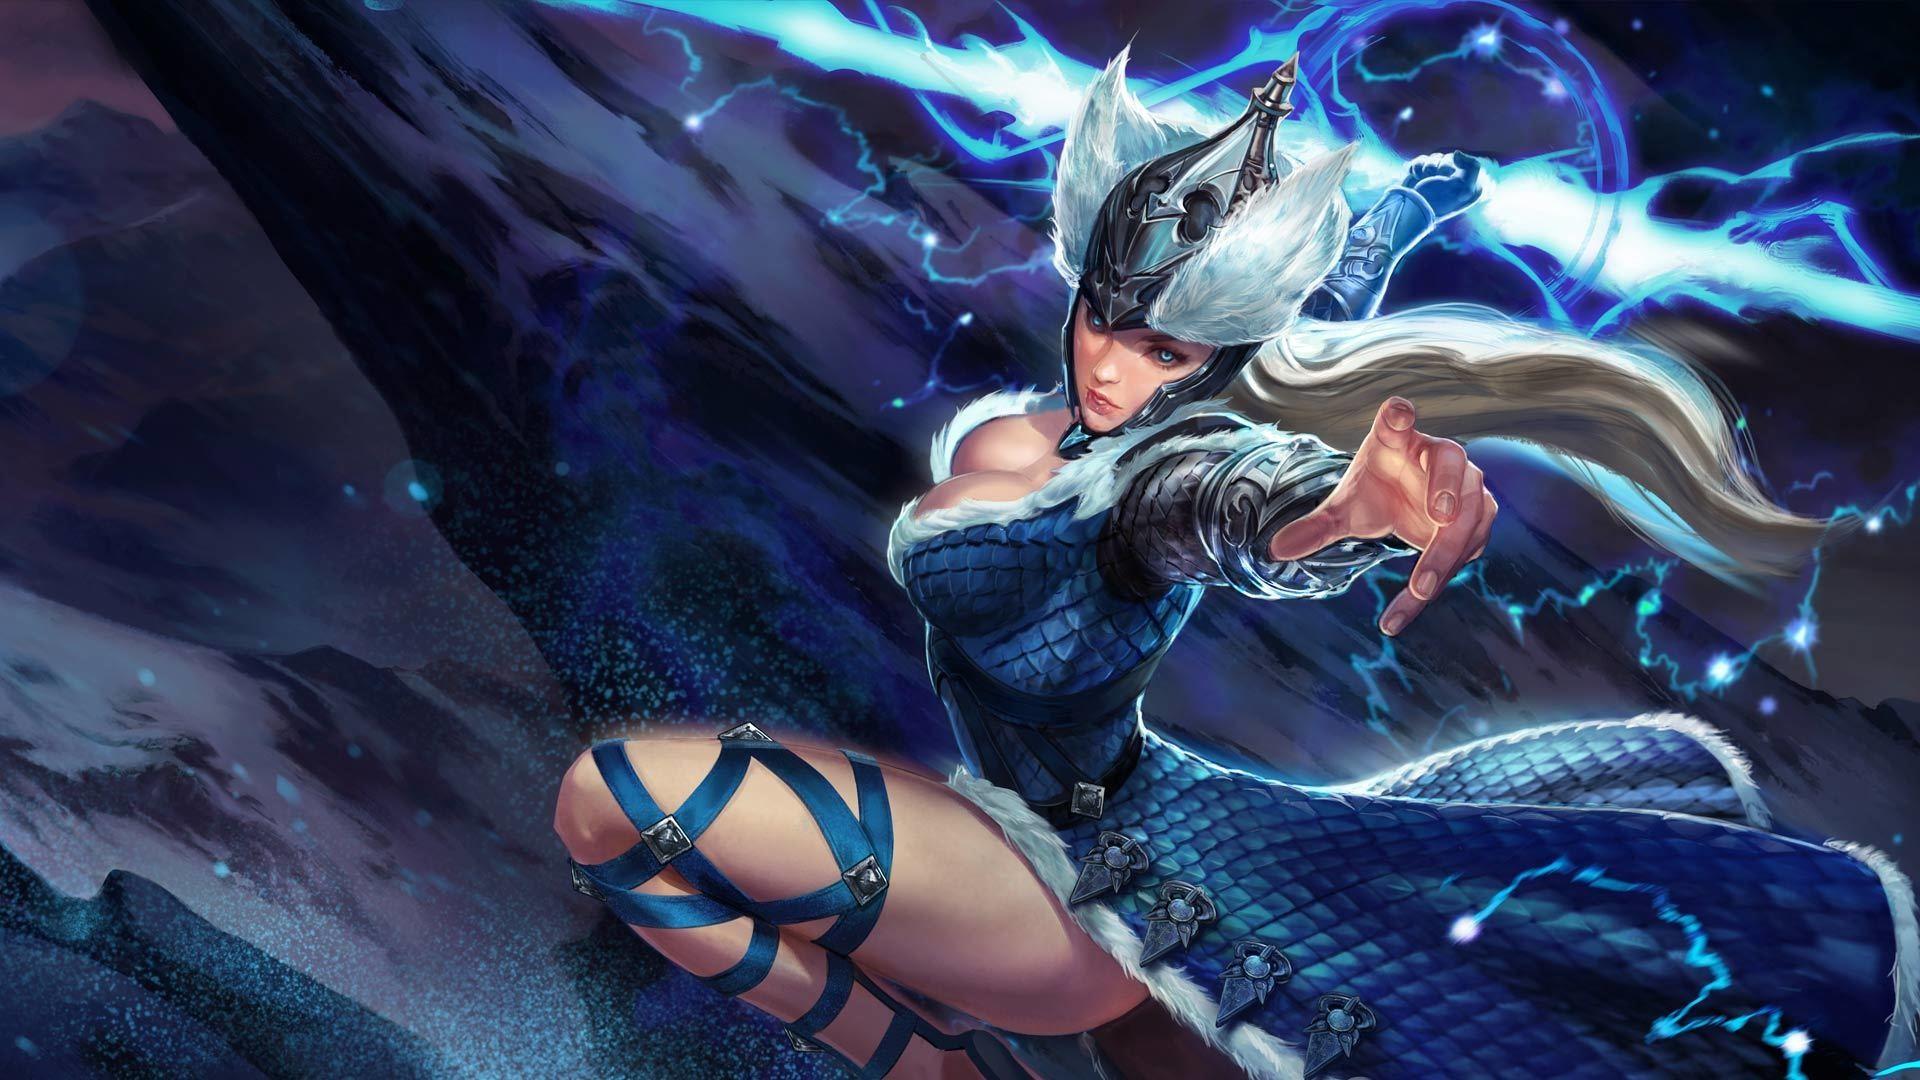 Wallpaper Varya, girl warrior, vainglory, video game